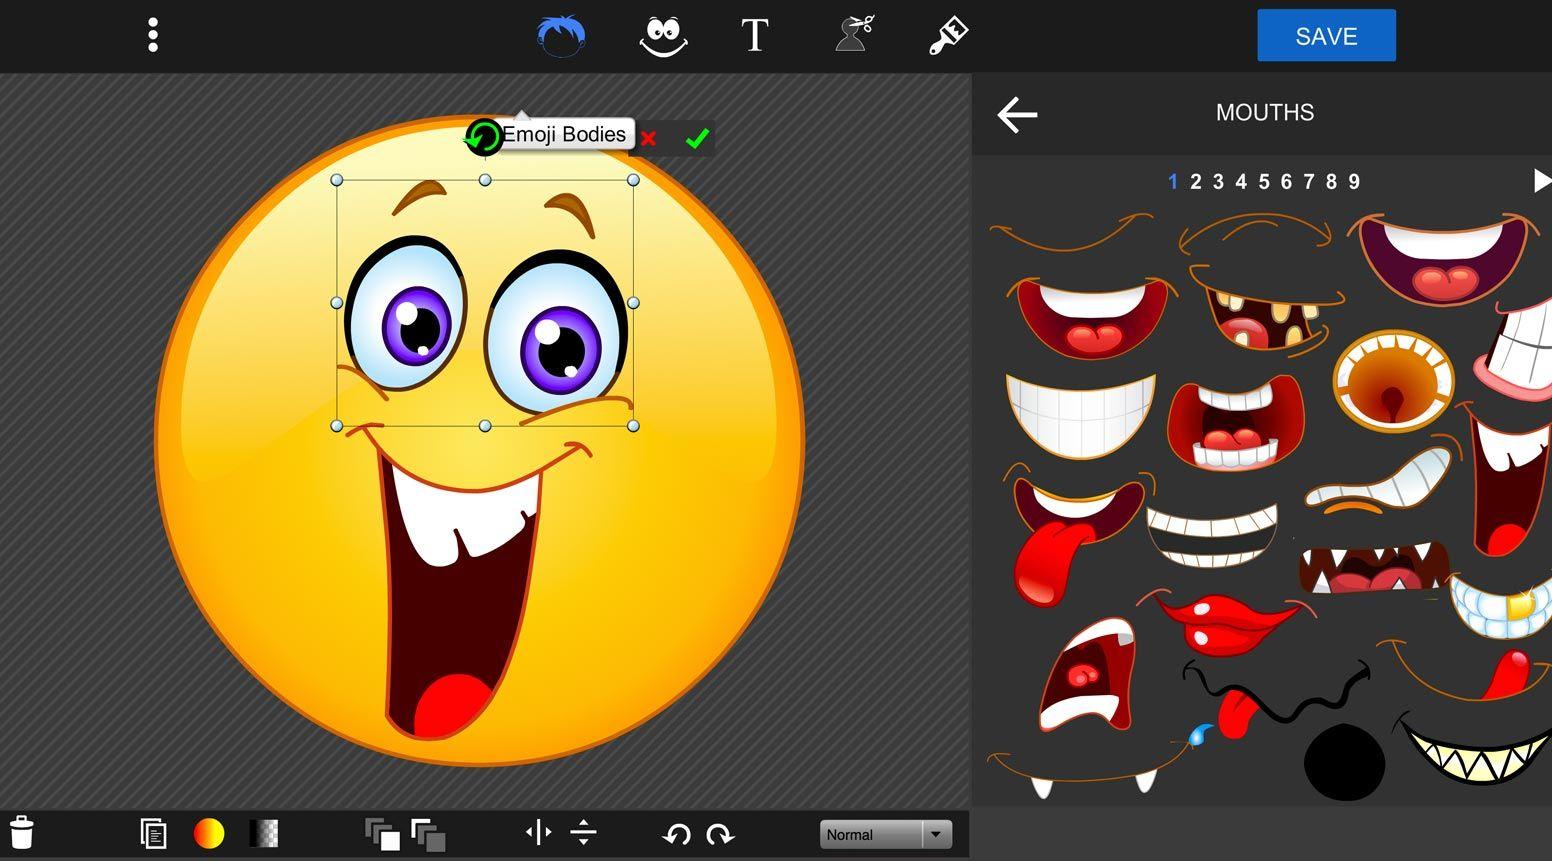 Online Emoji Maker Design Your Own Emoji Pizap Cute Wallpapers Quotes Collage Maker Iphone Wallpaper Vintage